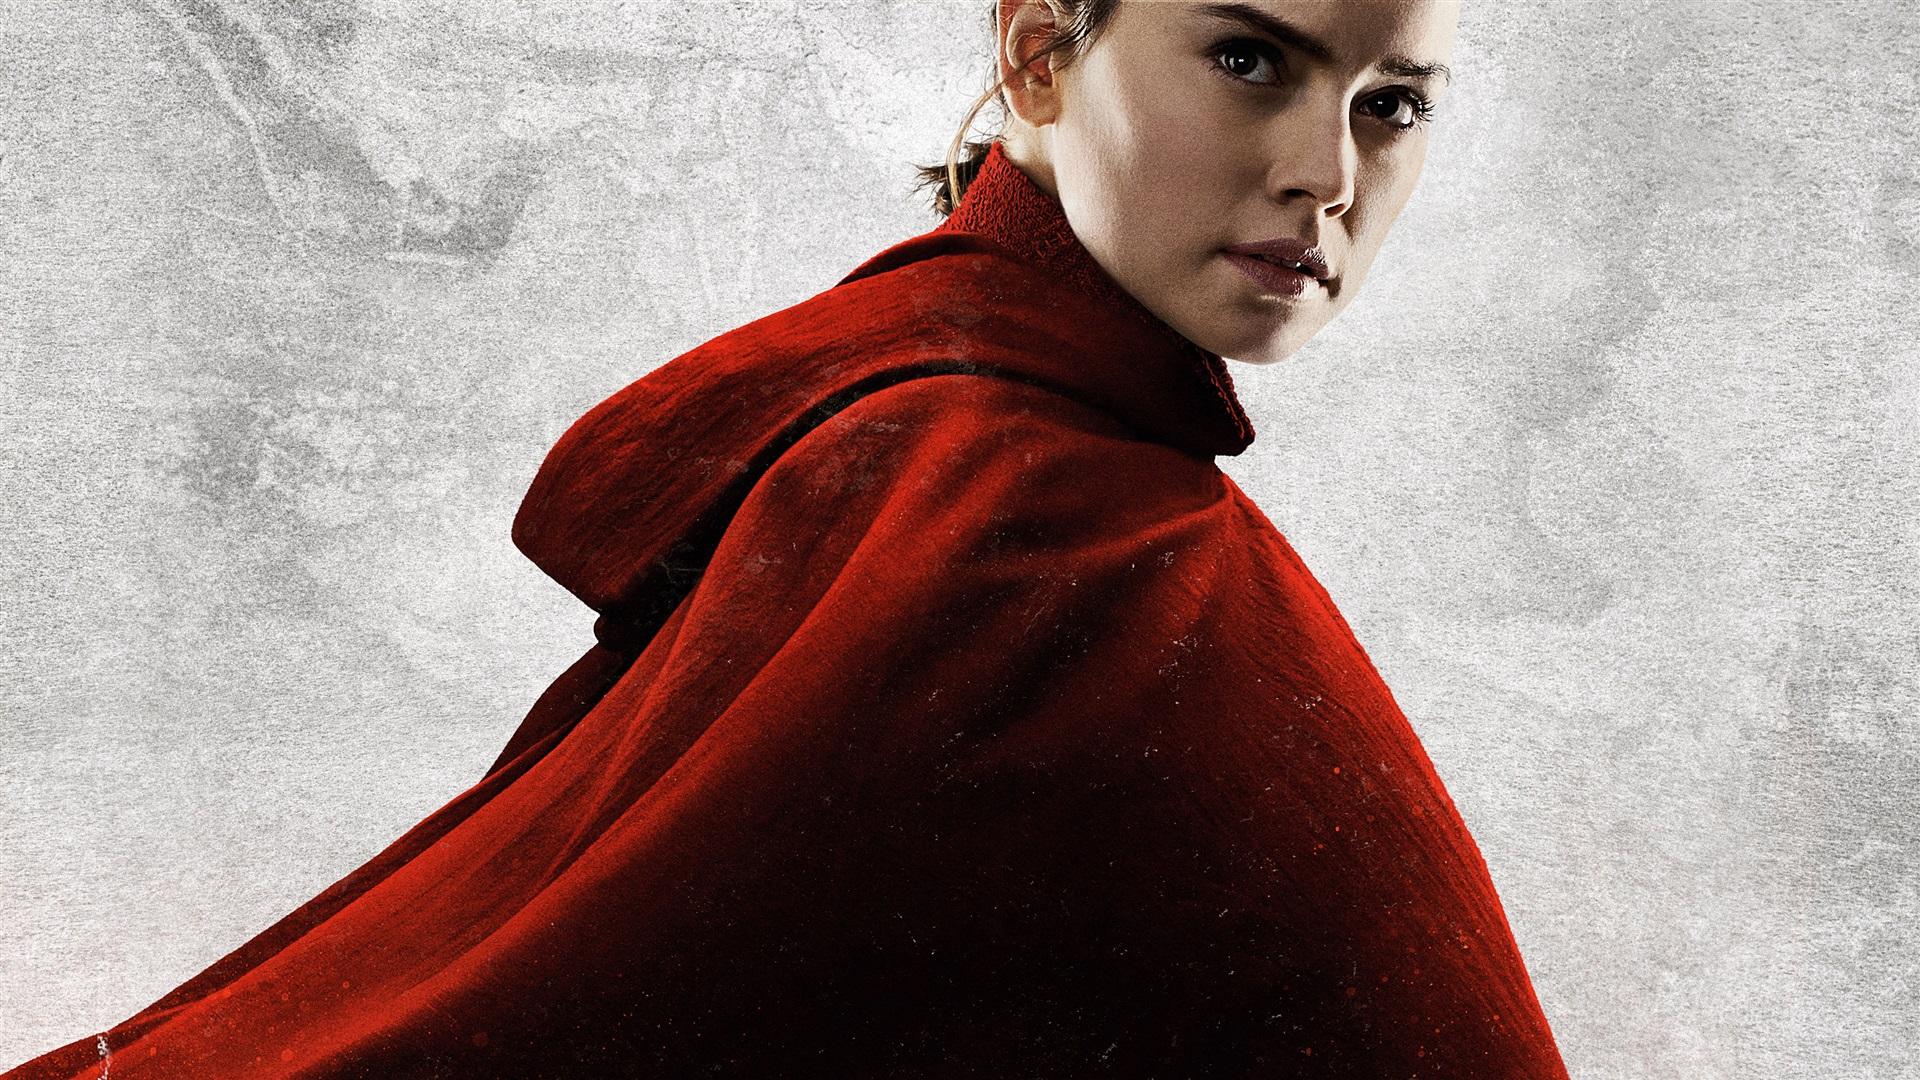 Wallpaper Daisy Ridley Star Wars The Last Jedi 3840x2160 Uhd 4k Picture Image